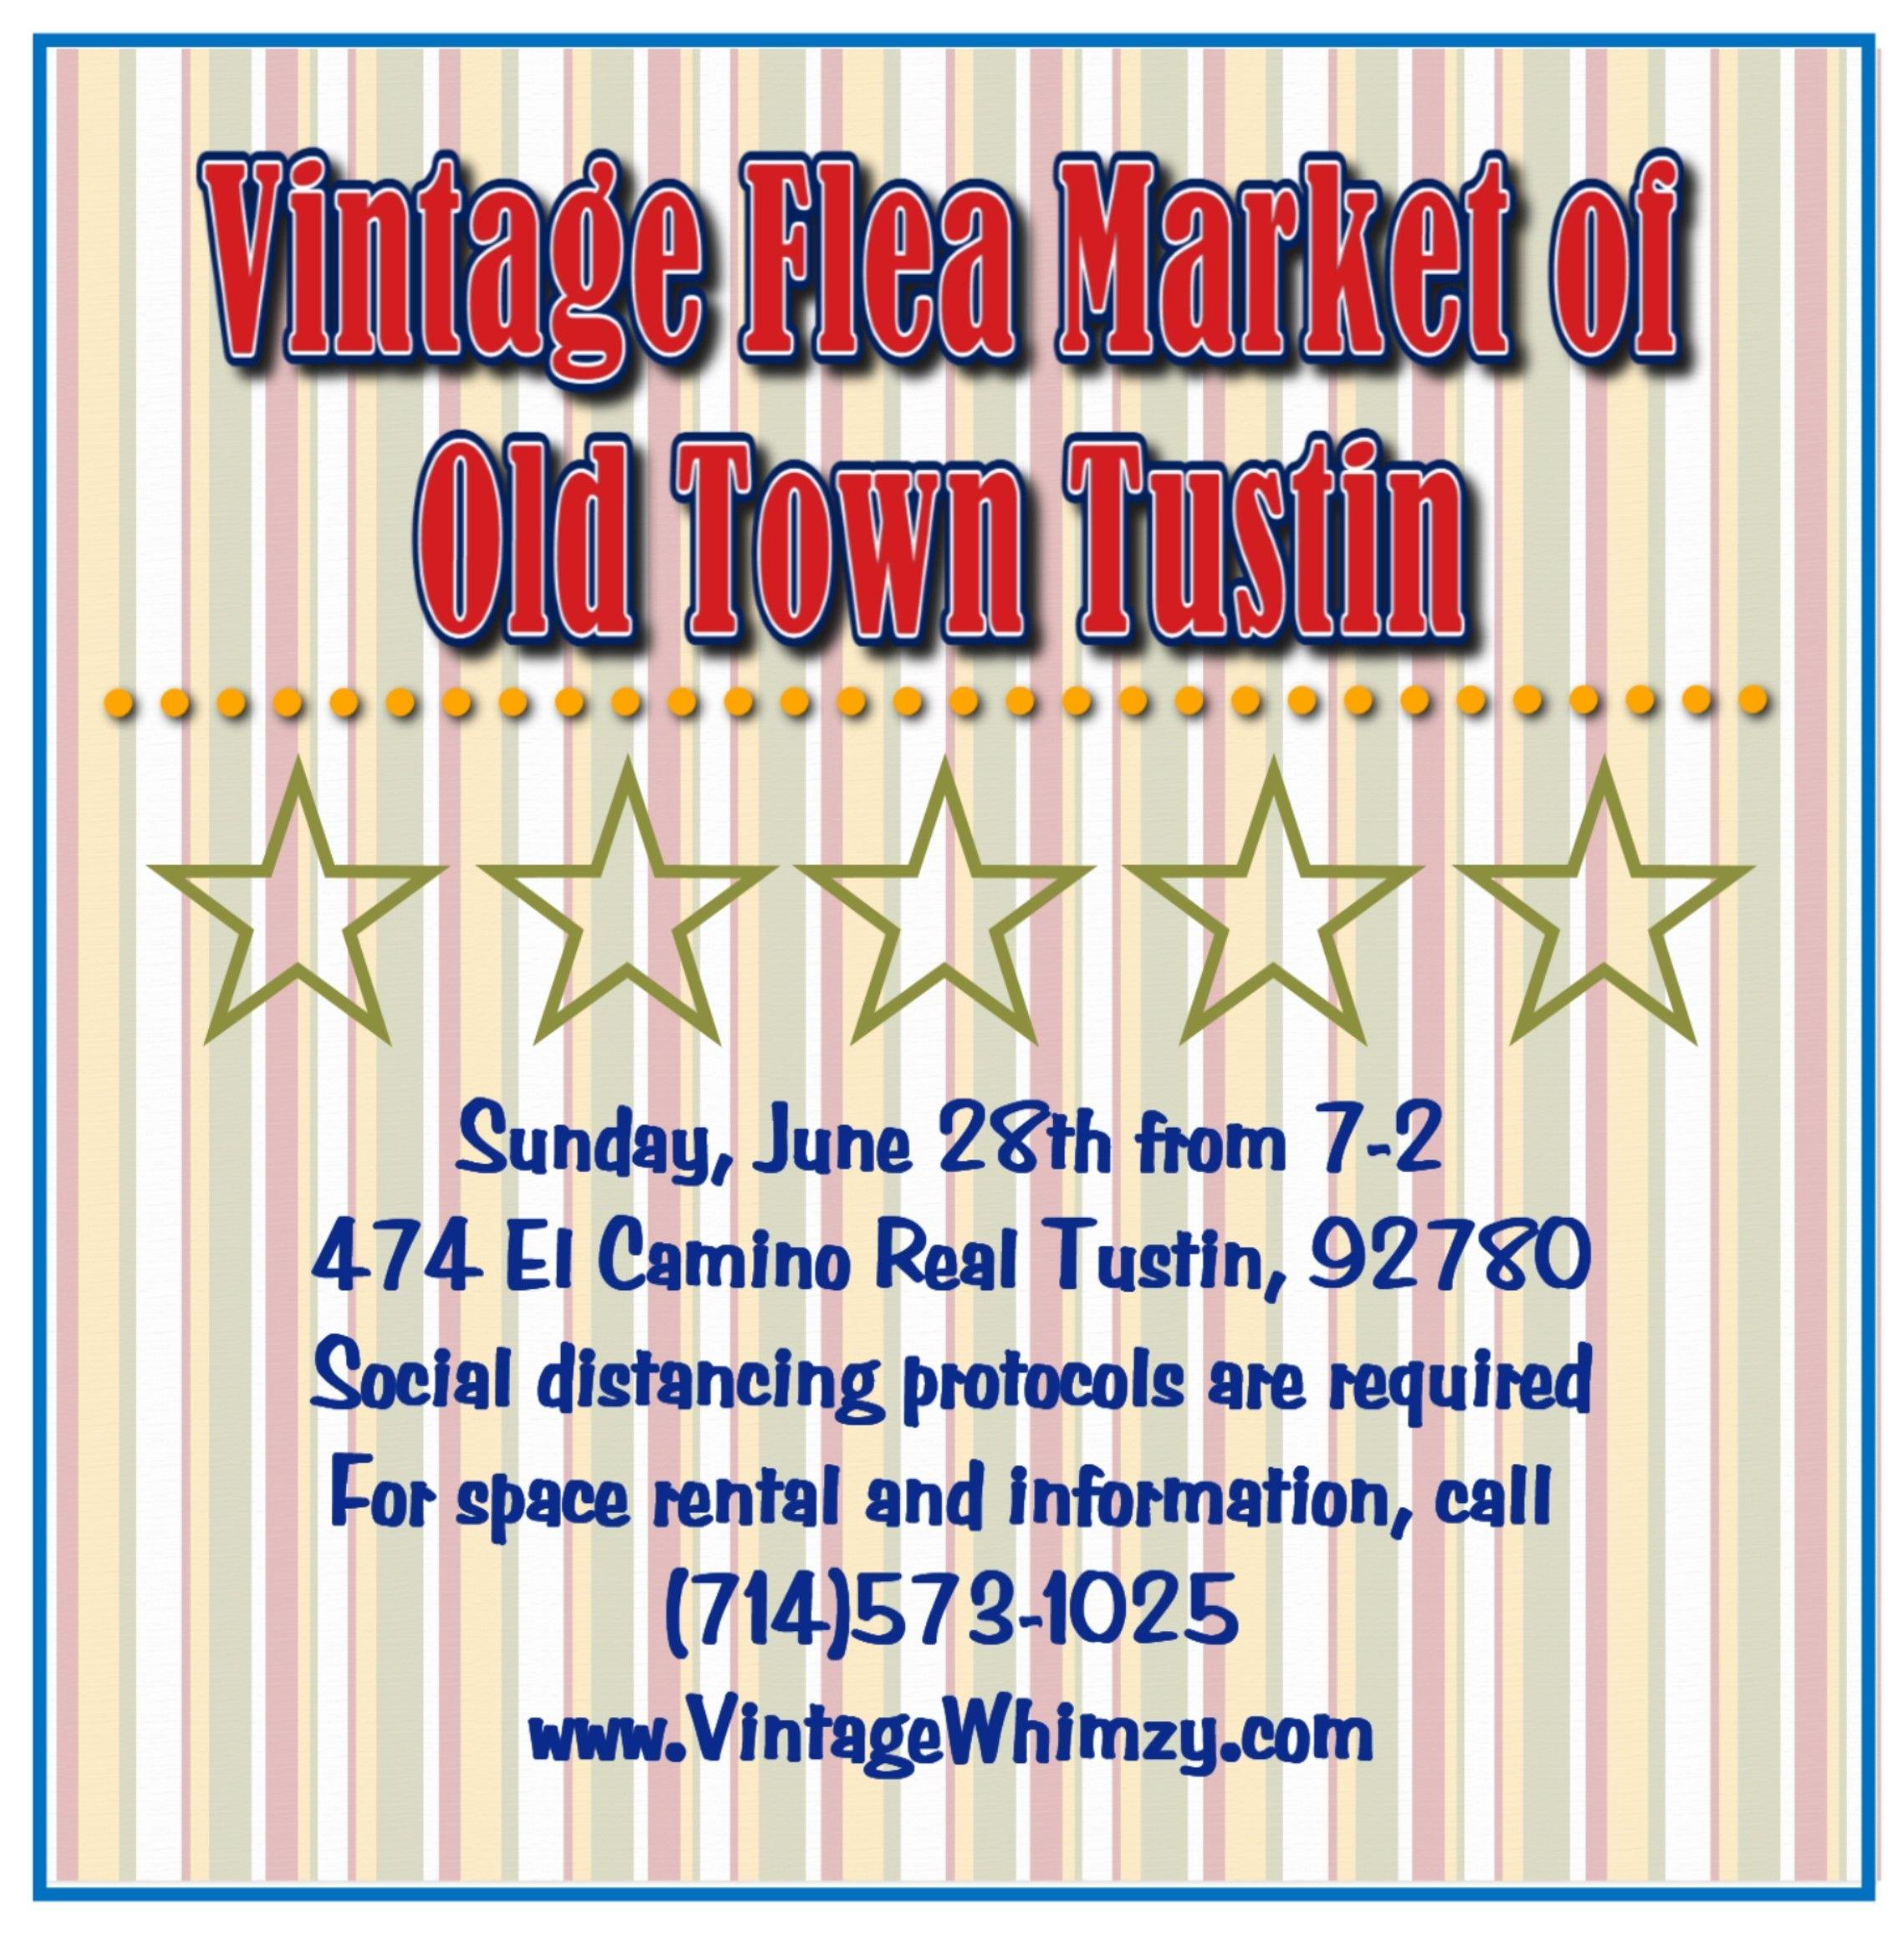 The Ott Flea This Sunday 6 28 In Tustin Tustin Vintage Flea Market Fleas